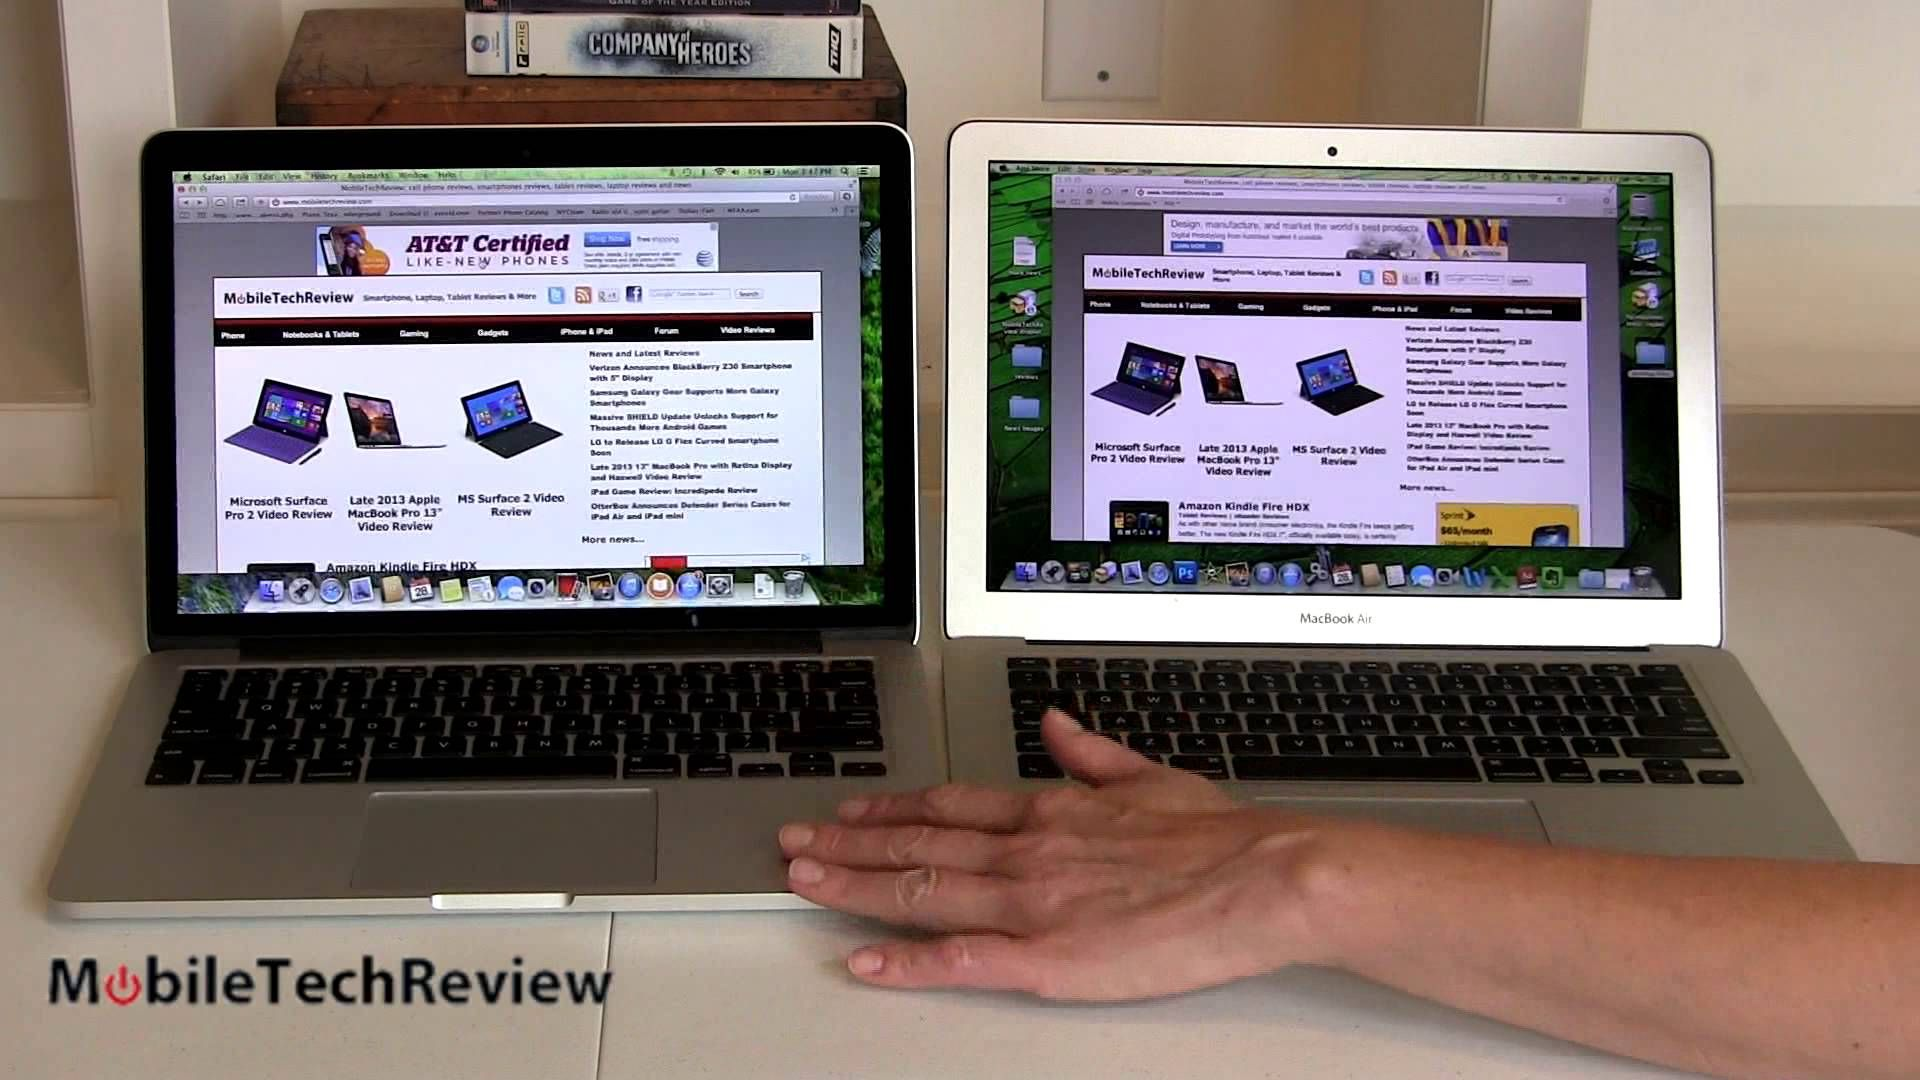 2013 13 Retina Macbook Pro Vs 13 Macbook Air Comparison Smackdown Macbook Retina Technology Mobile Phone